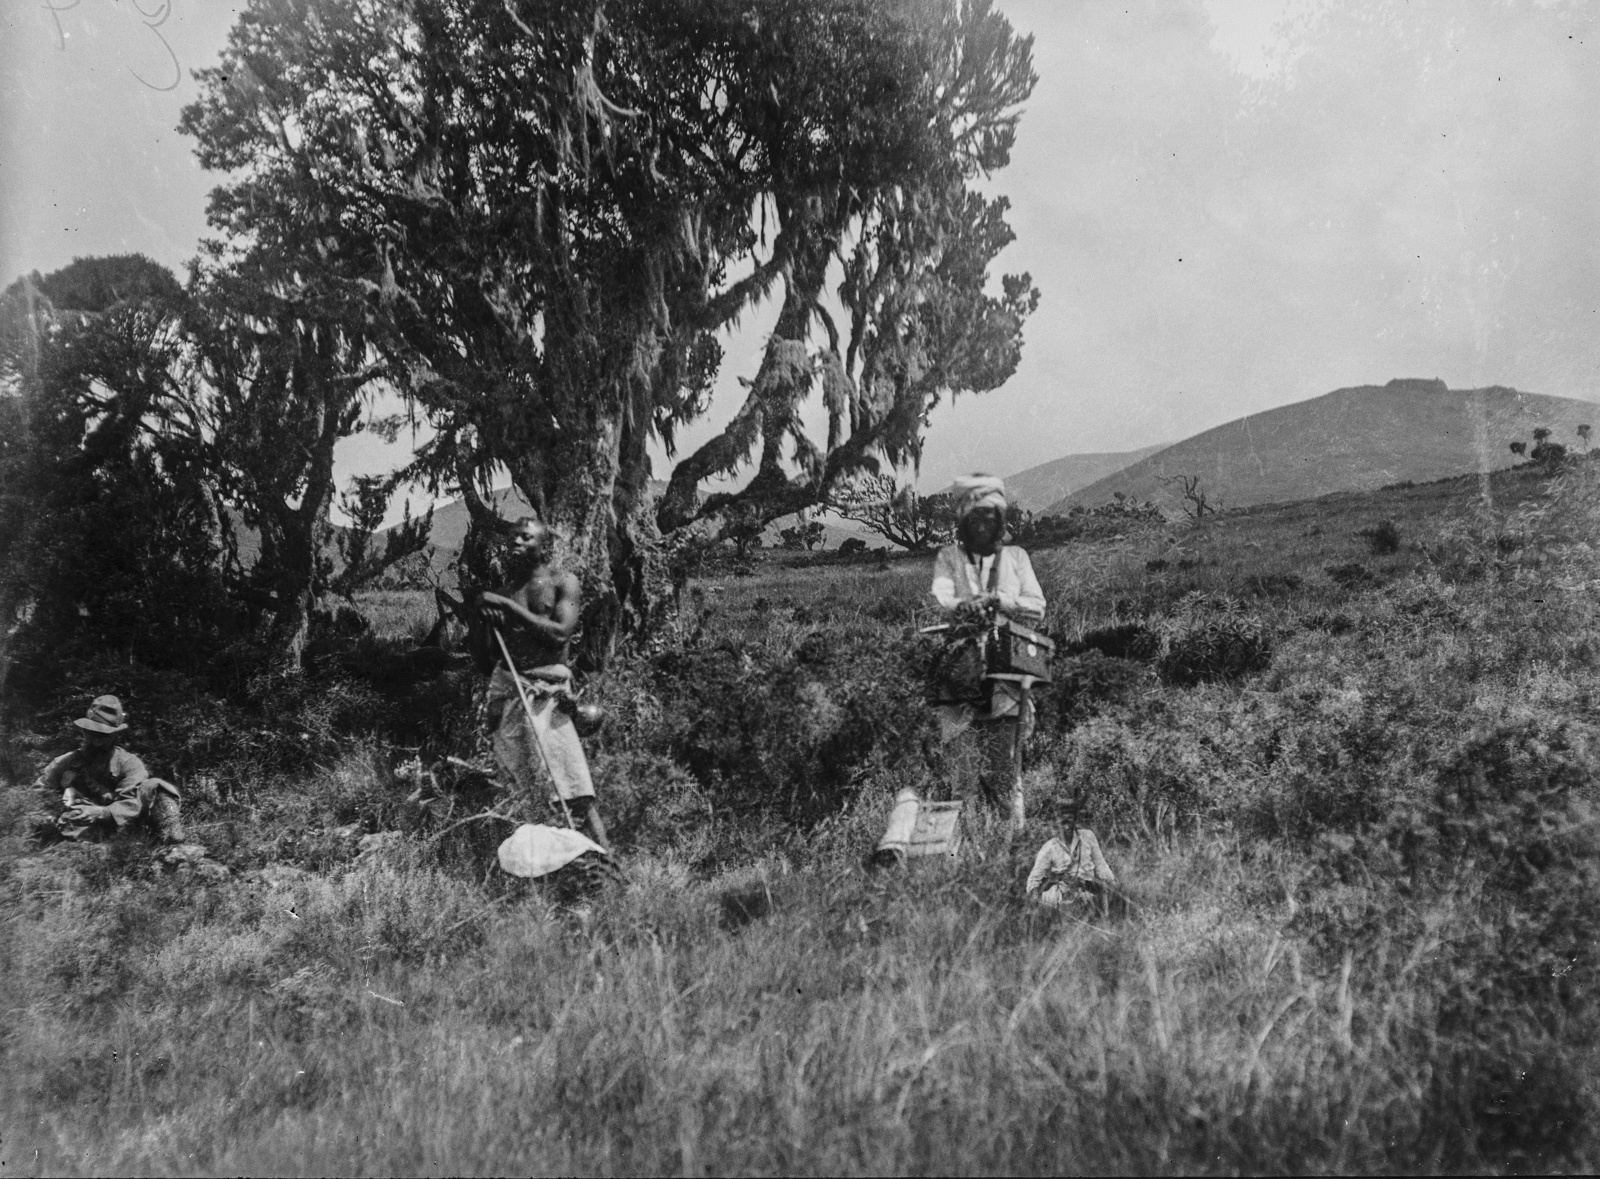 276. Ландшафт в районе Килиманджаро